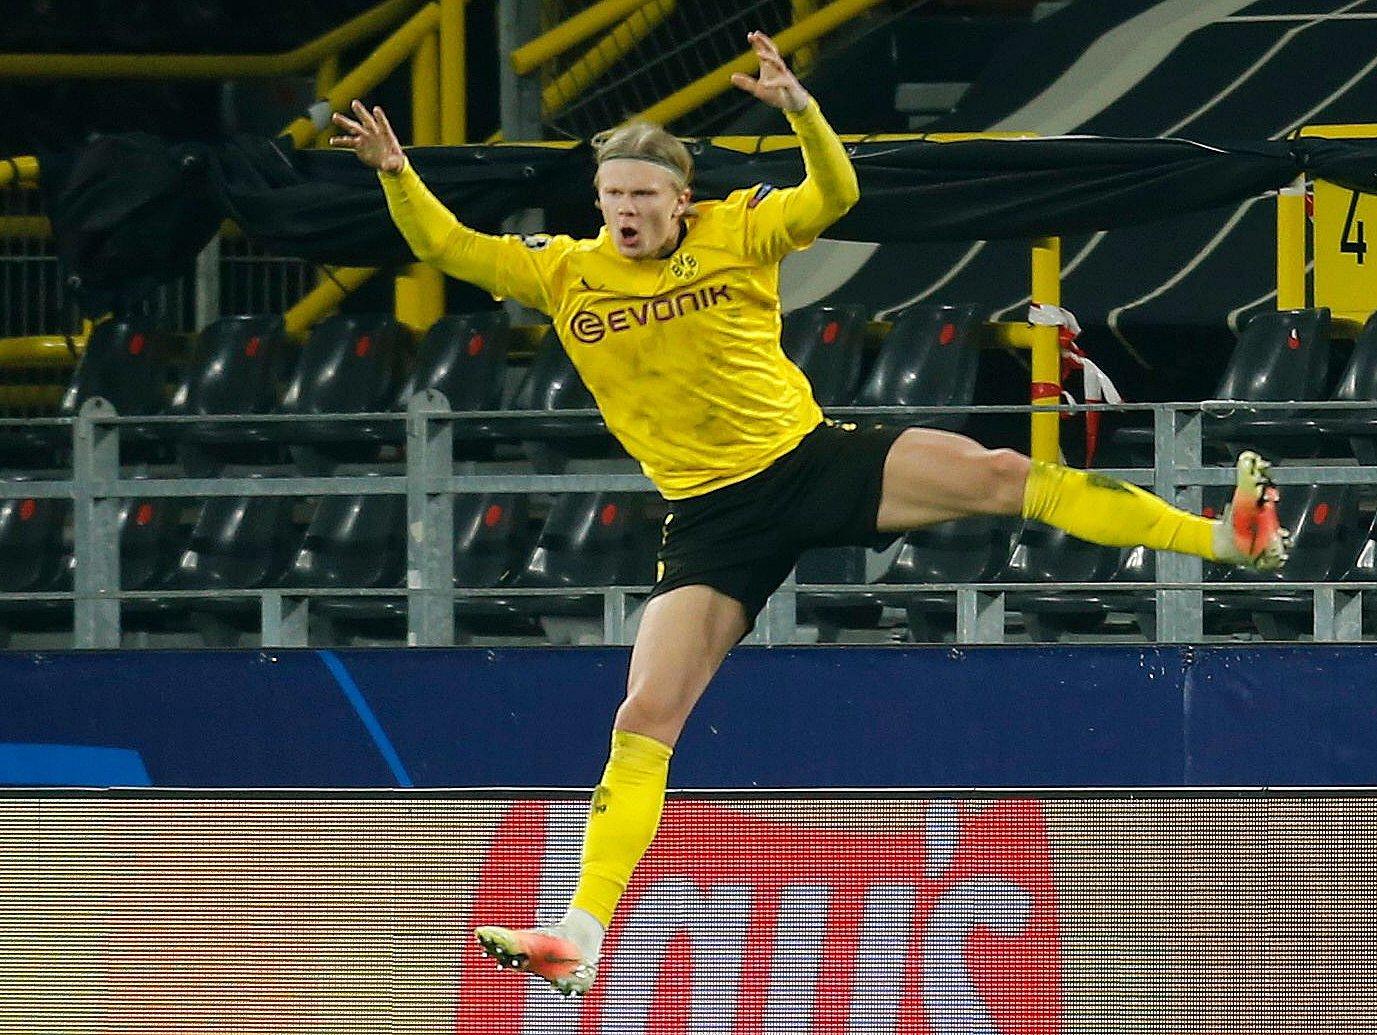 Borussia Dortmund's Erling Braut Haaland celebrates scoring against Sevilla at Signal Iduna Park, Dortmund, Germany, March 9, 2021. (Reuters Photo)